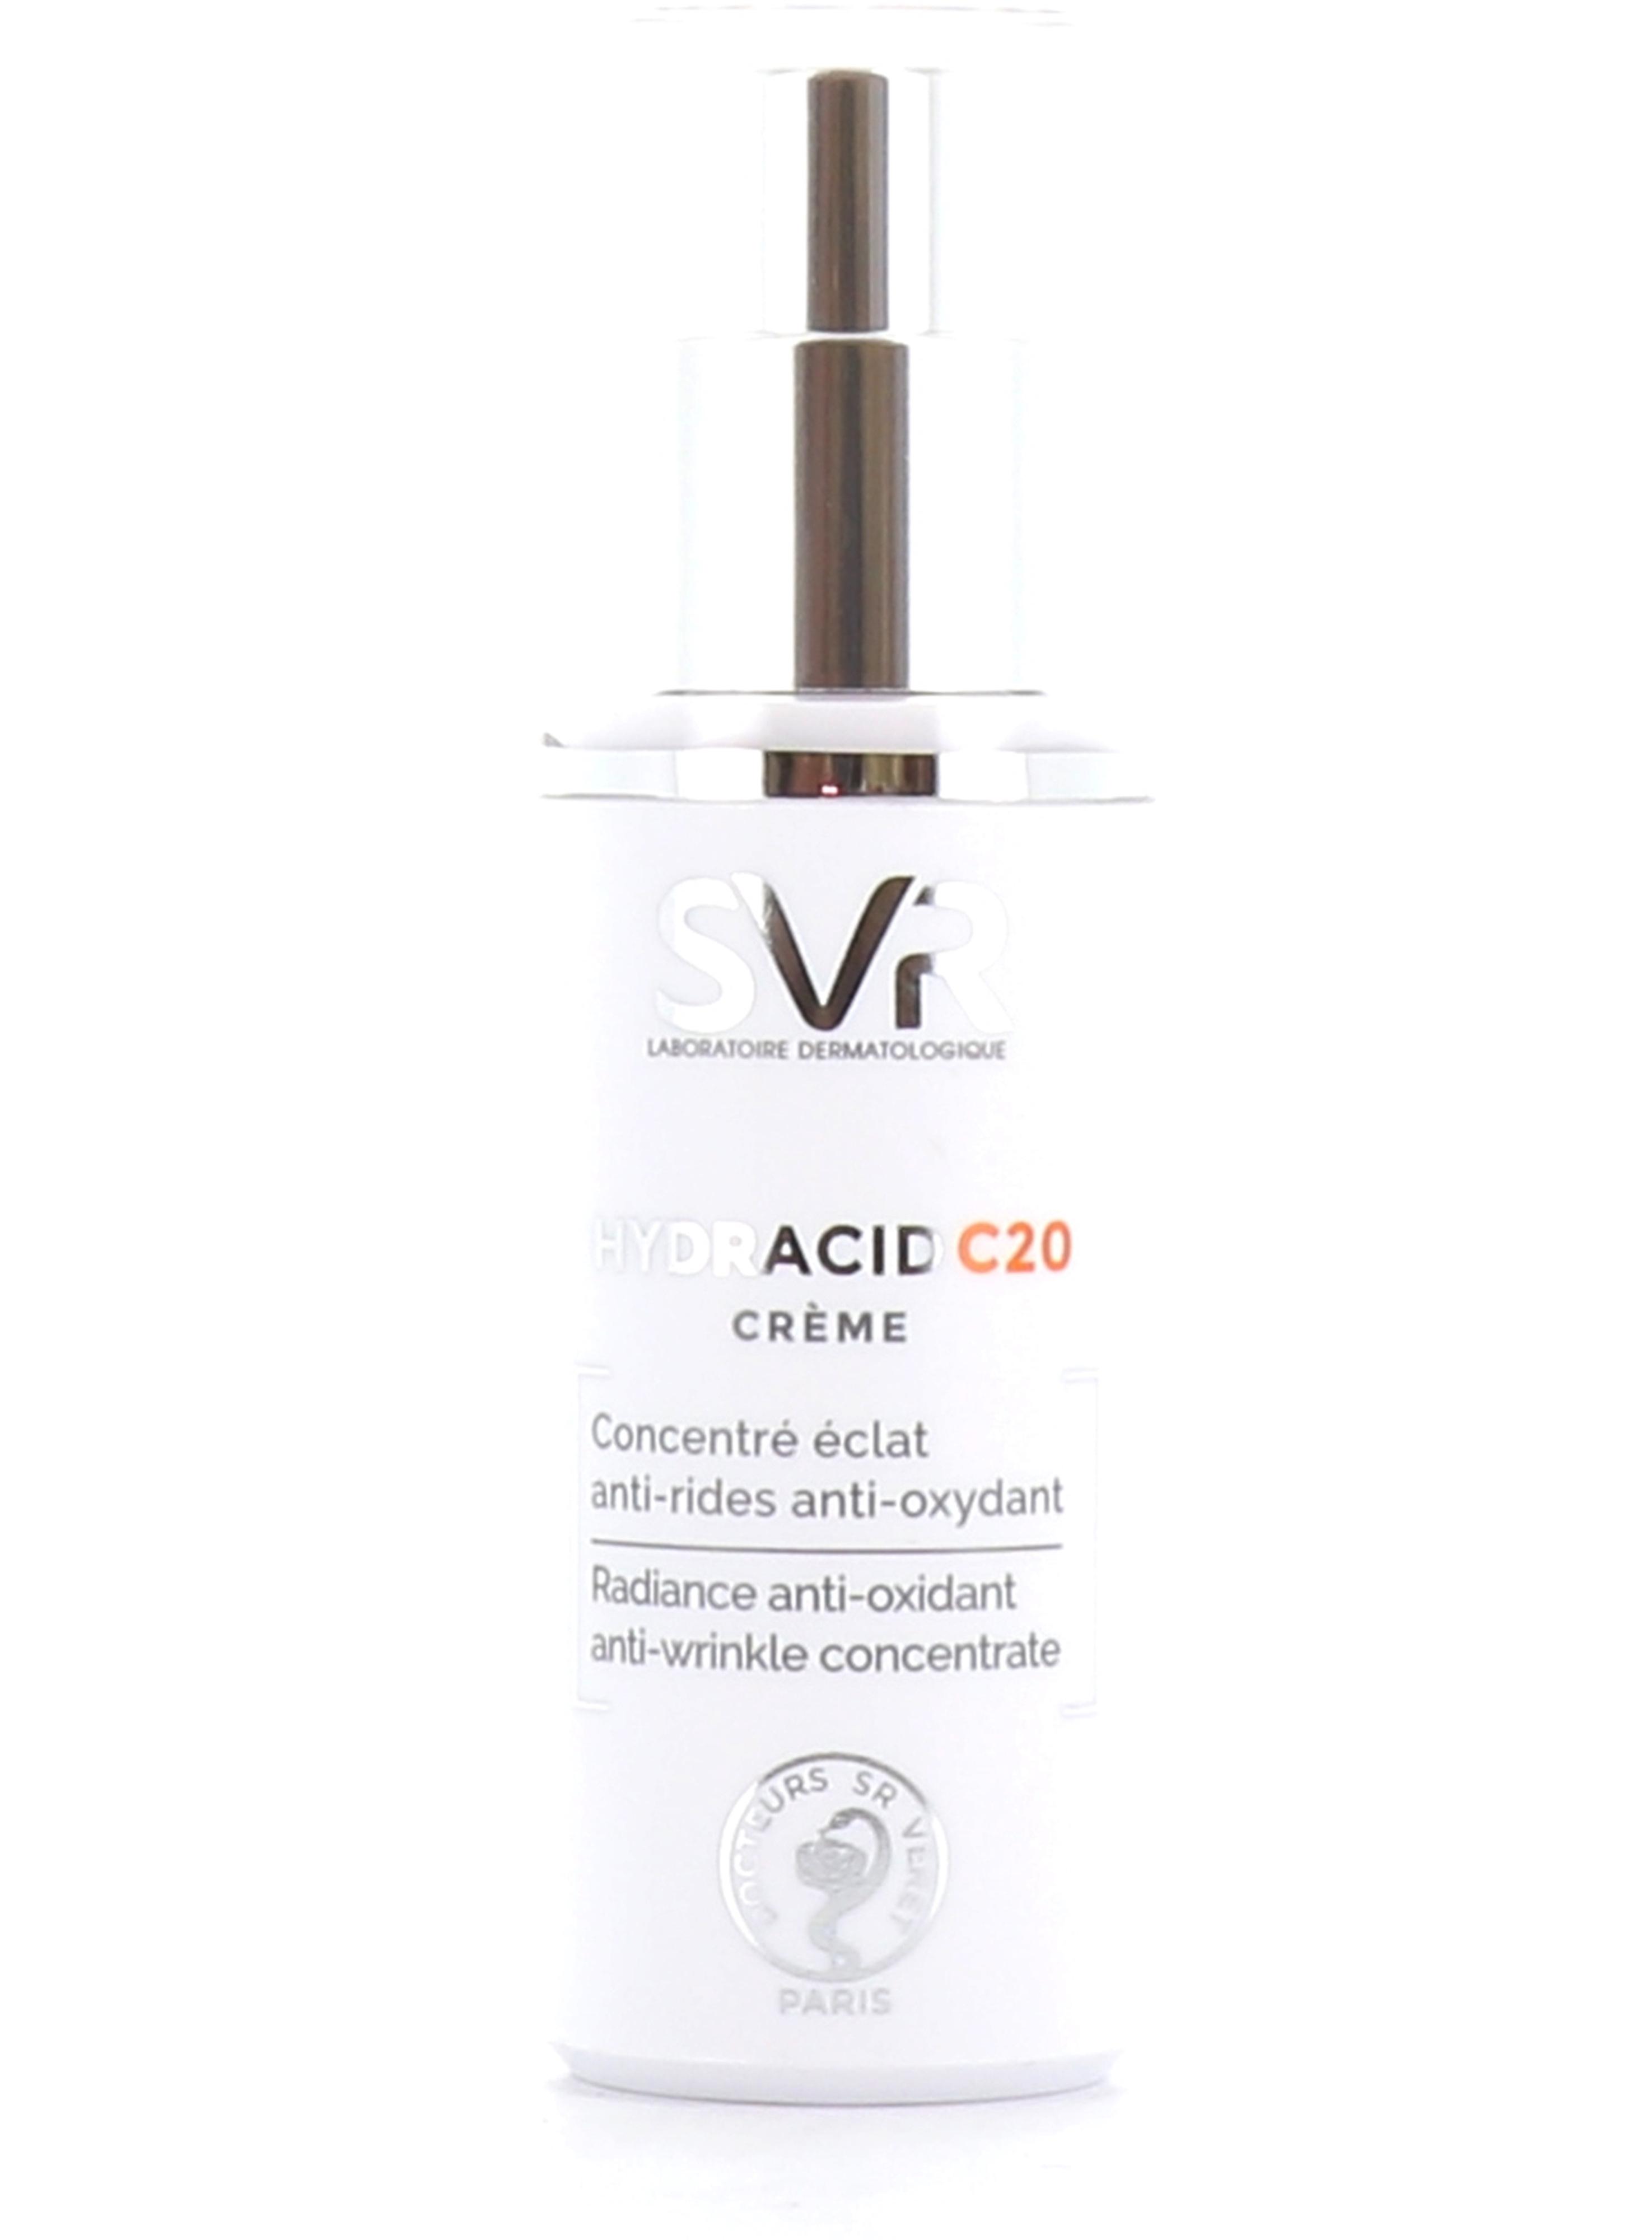 Hydracid C20 Crème - SVR - Pharmacie des drakkars